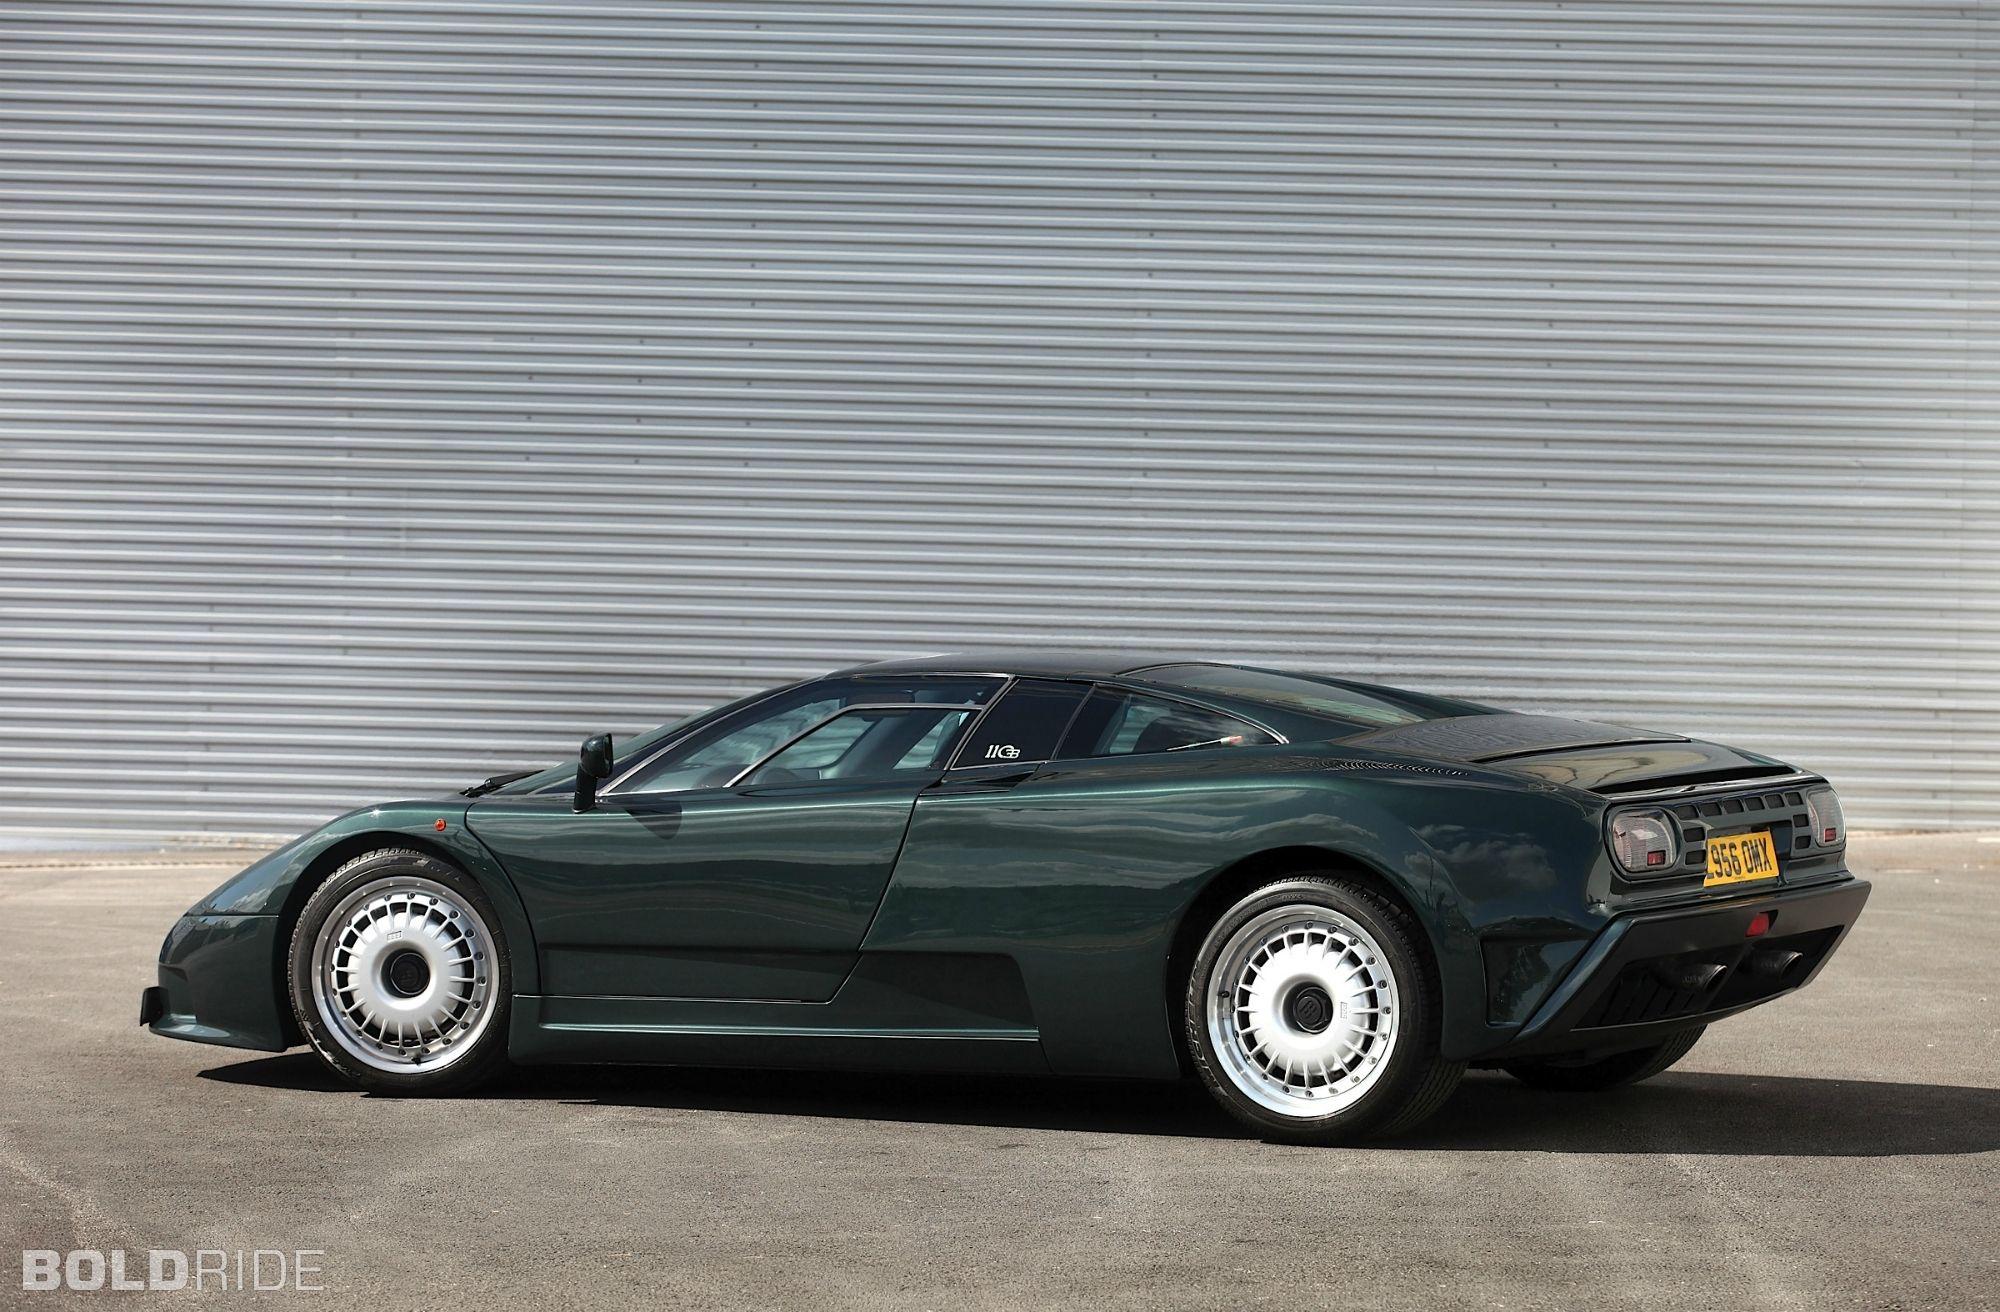 1991 Bugatti Eb110 Gt Dark Green Bugatti Eb110 Super Cars Bugatti